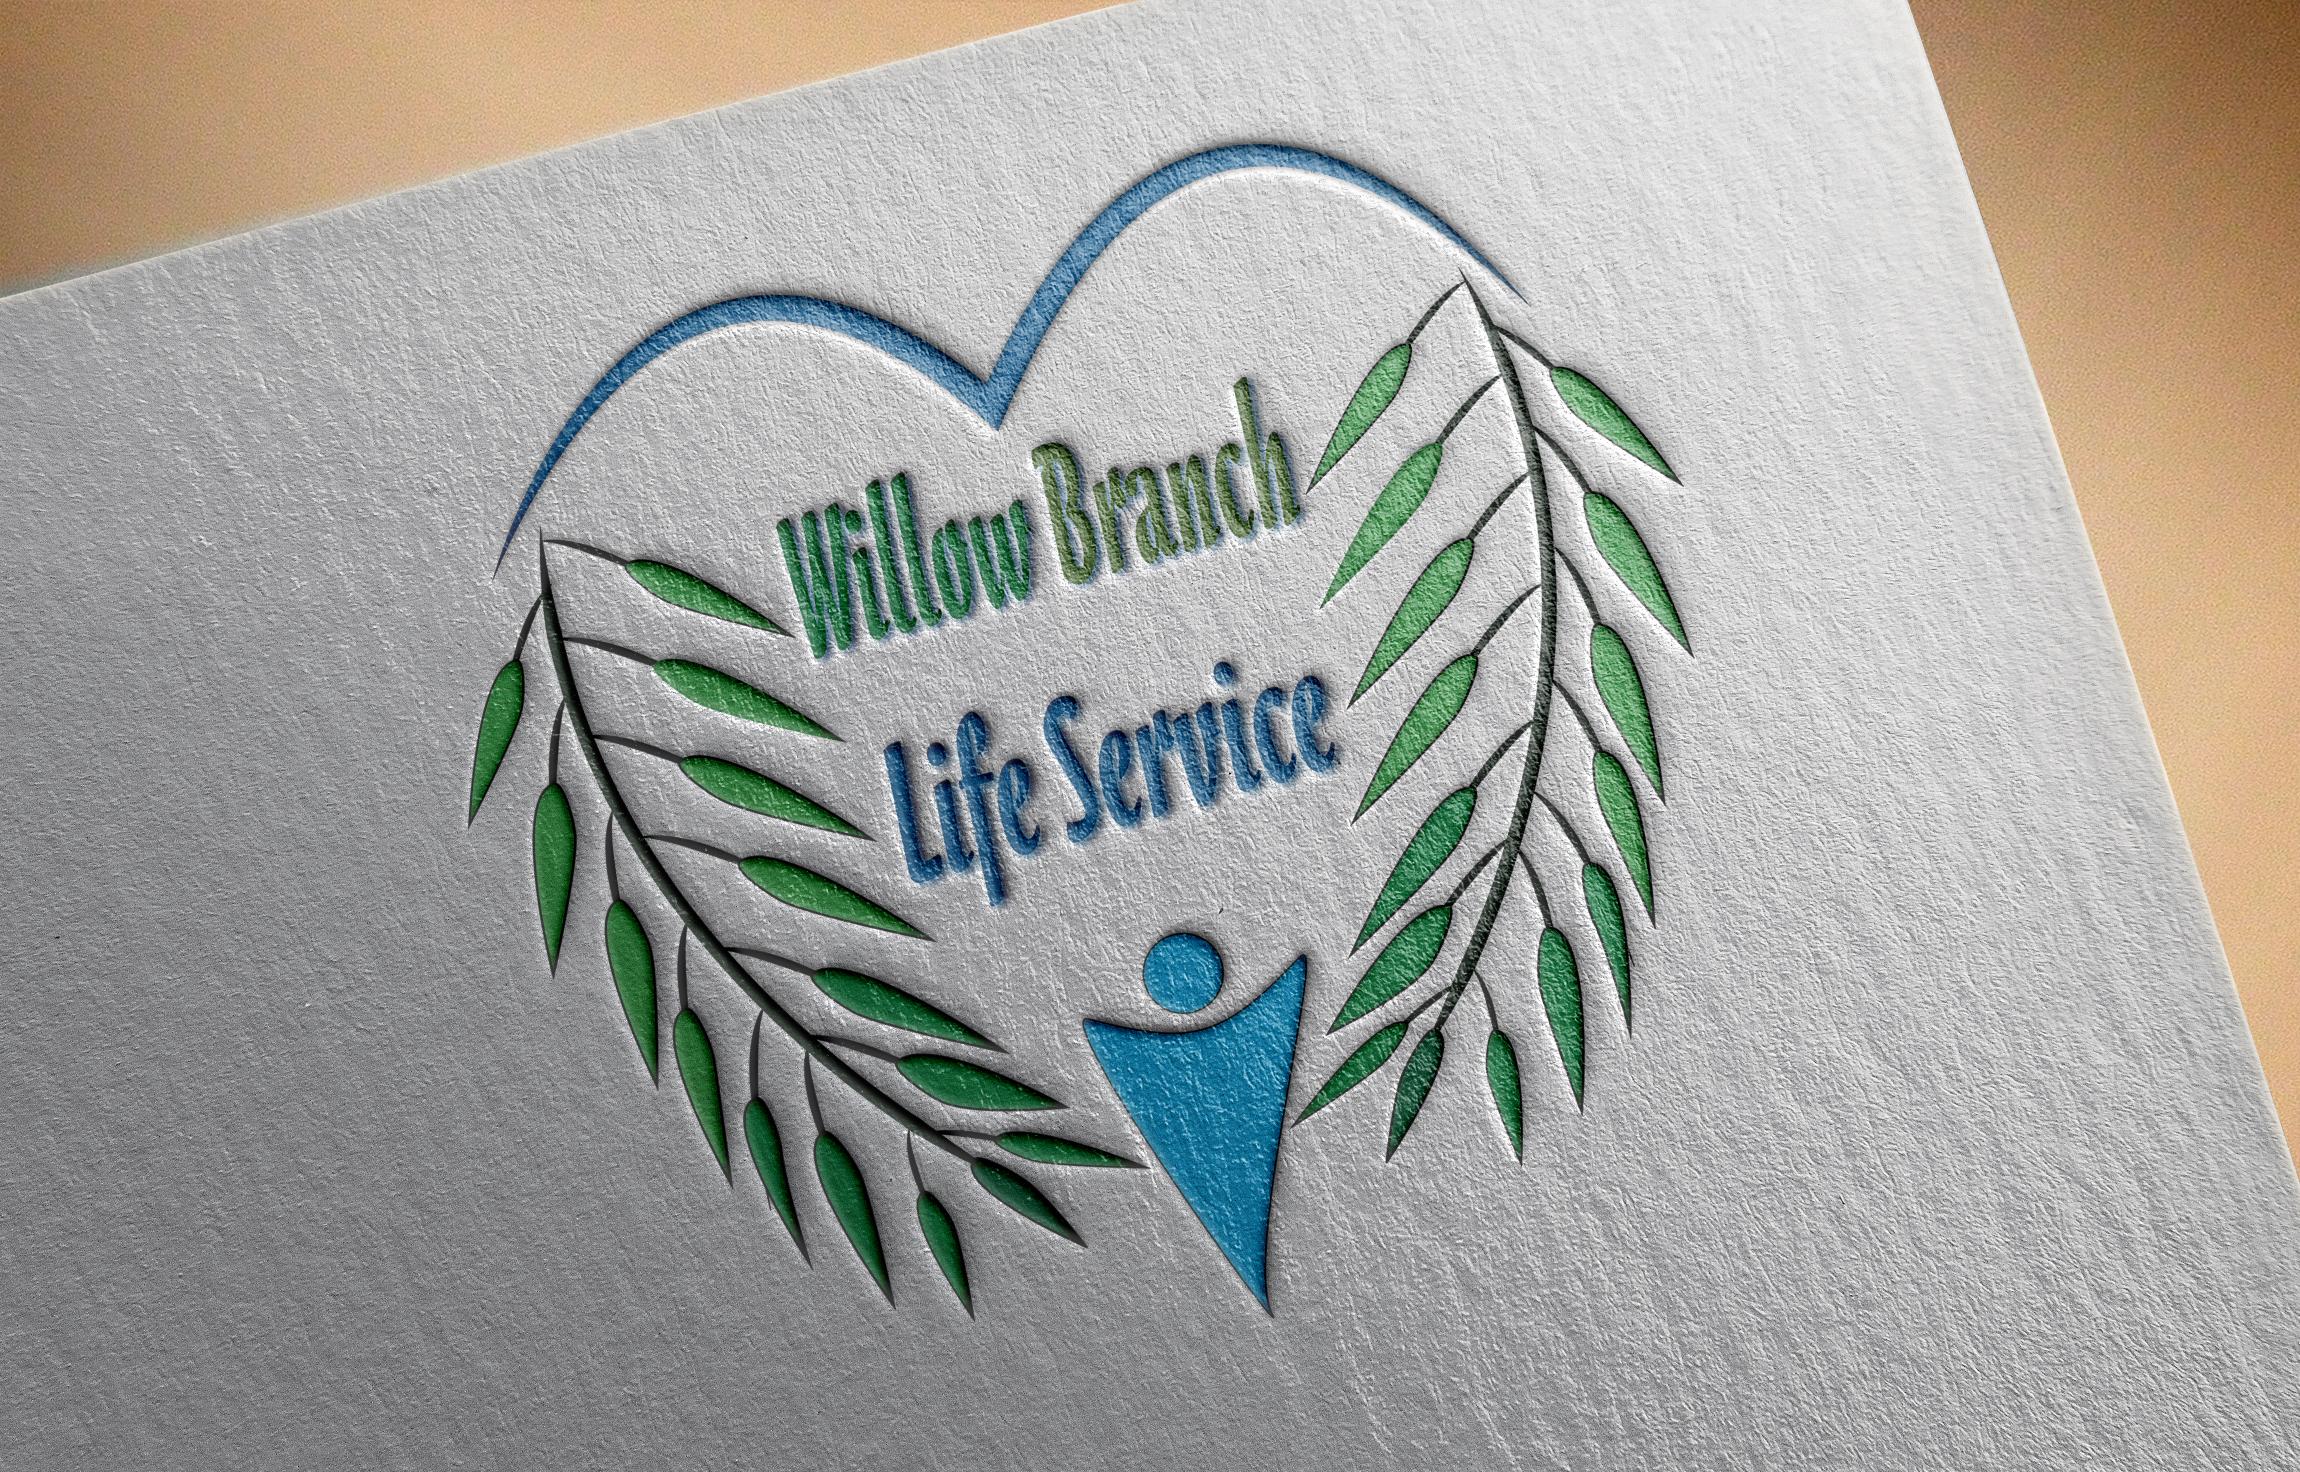 Logo Design by Goran Ledjenovic - Entry No. 10 in the Logo Design Contest Artistic Logo Design for Willow Branch Life Service.